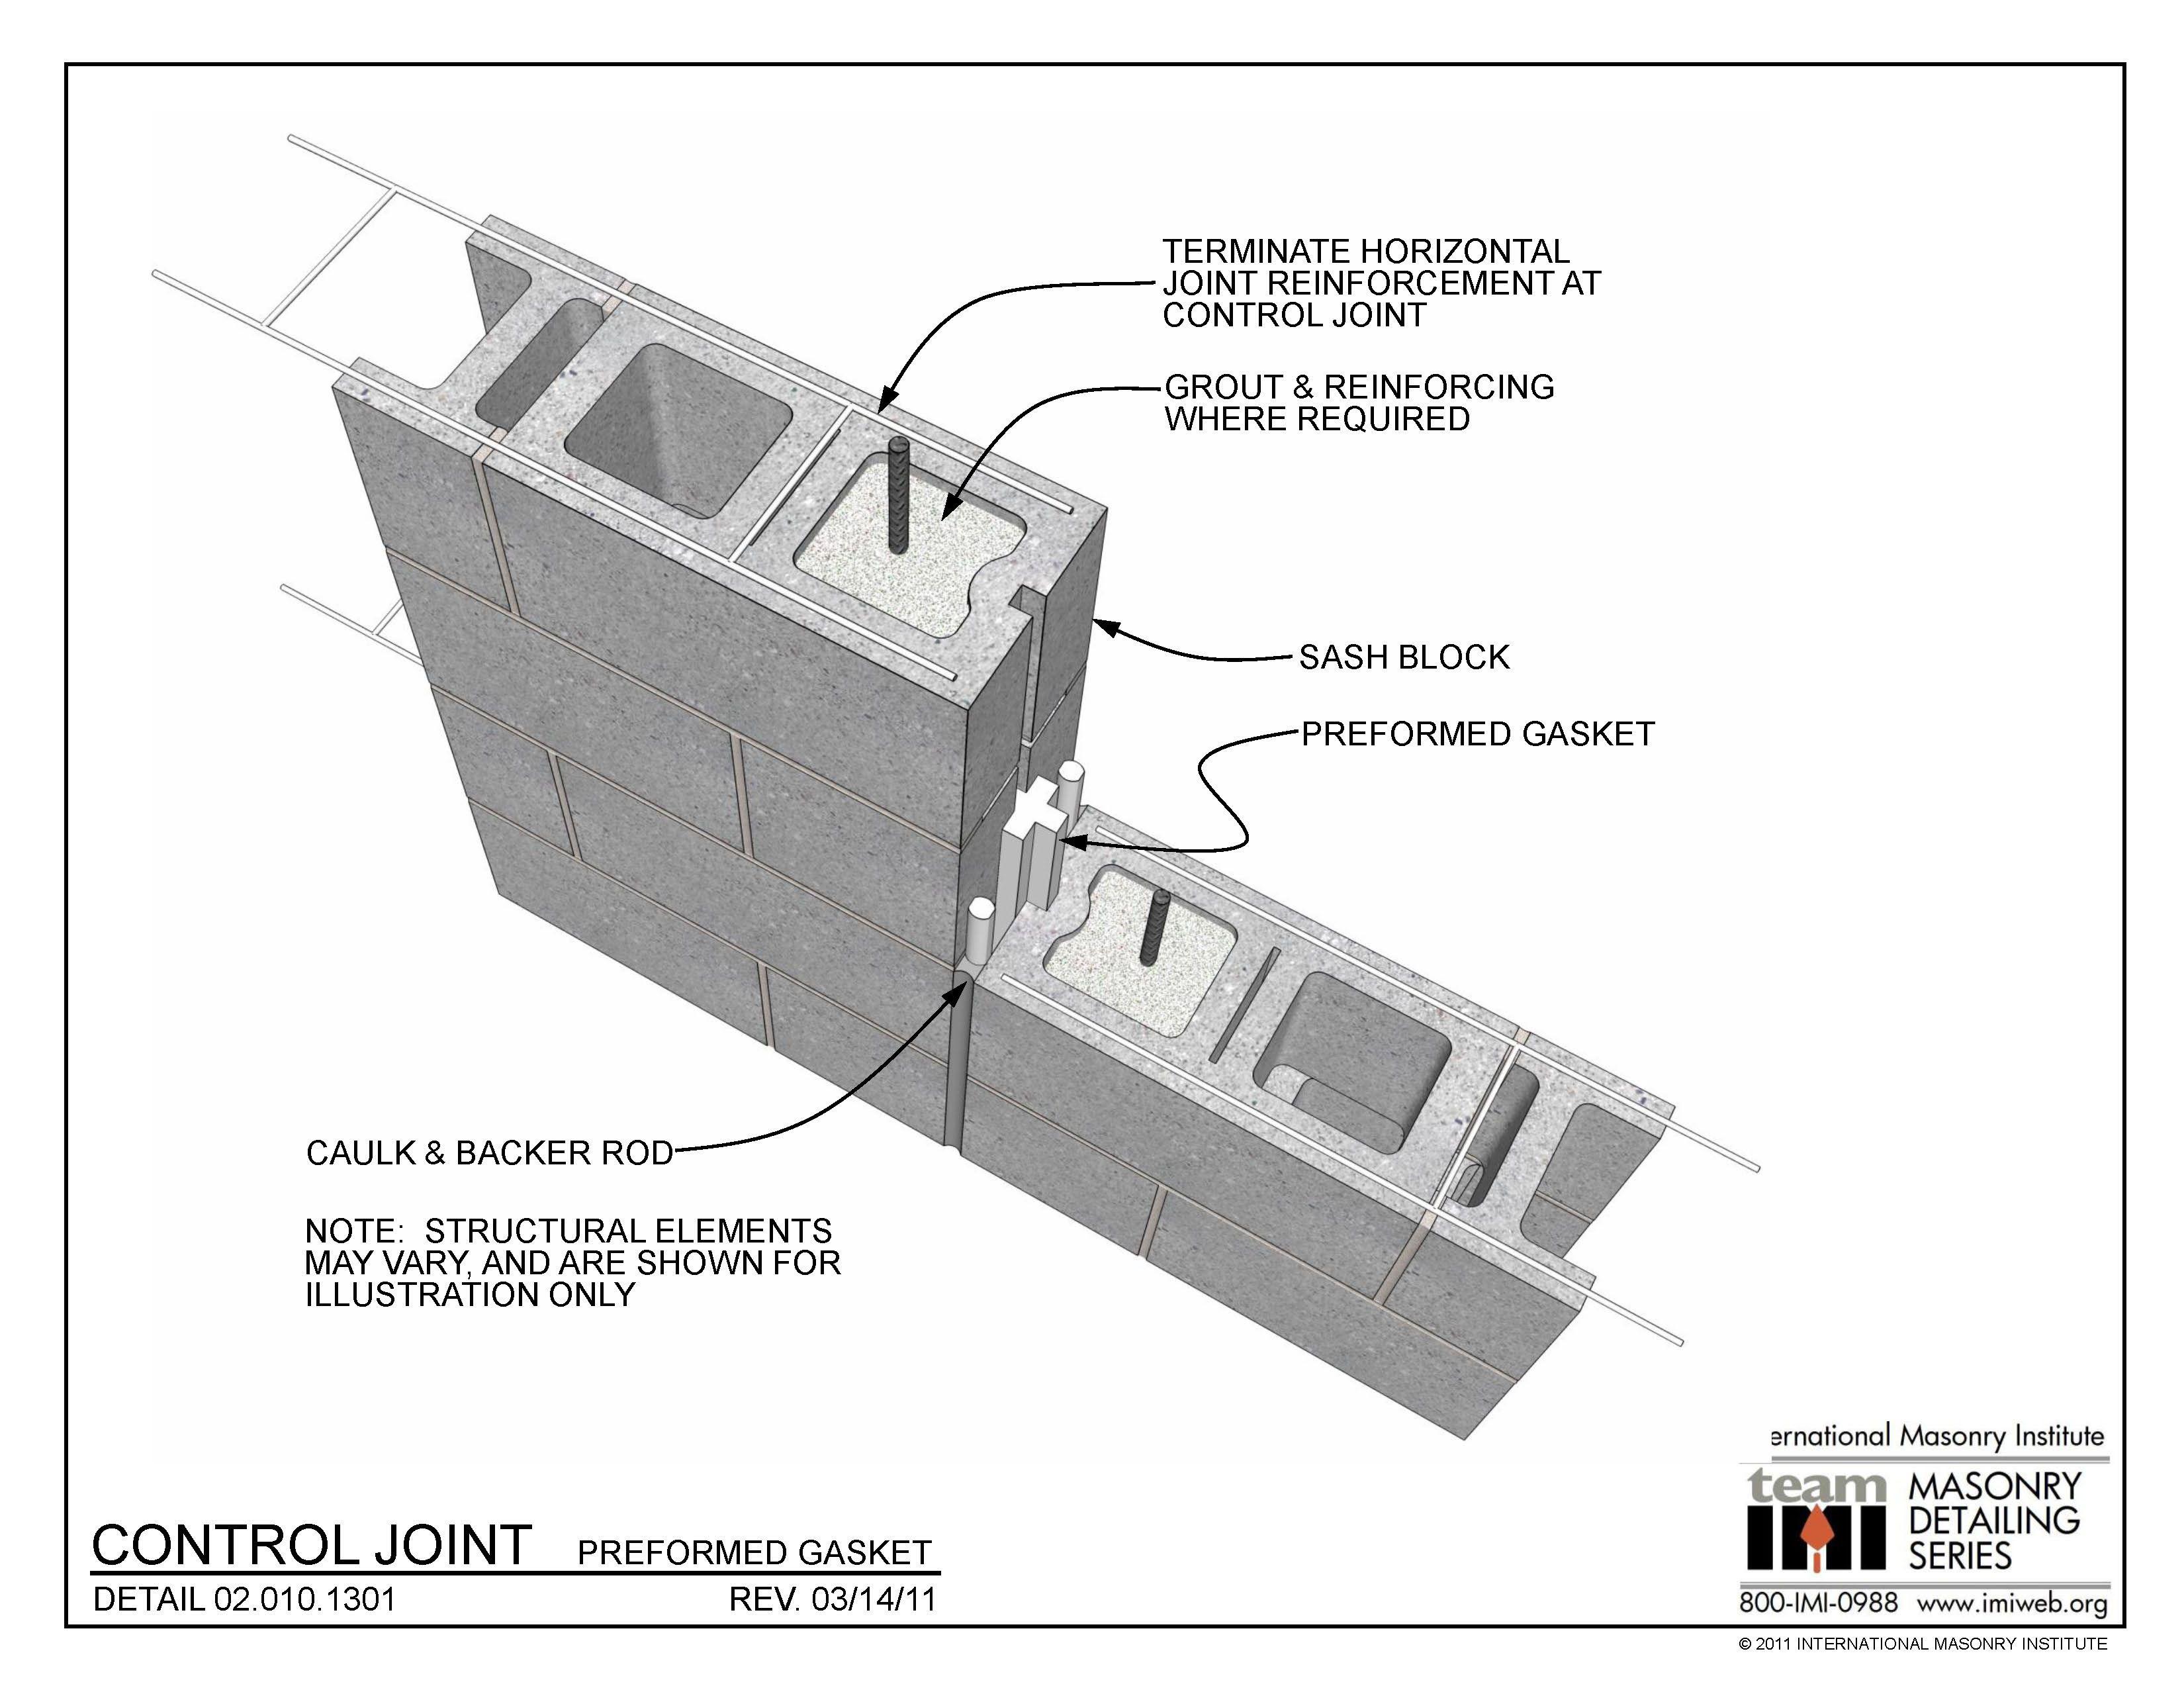 02 010 1301 Control Joint Preformed Gasket International Masonry Institute Masonry Masonry Wall Wall Systems